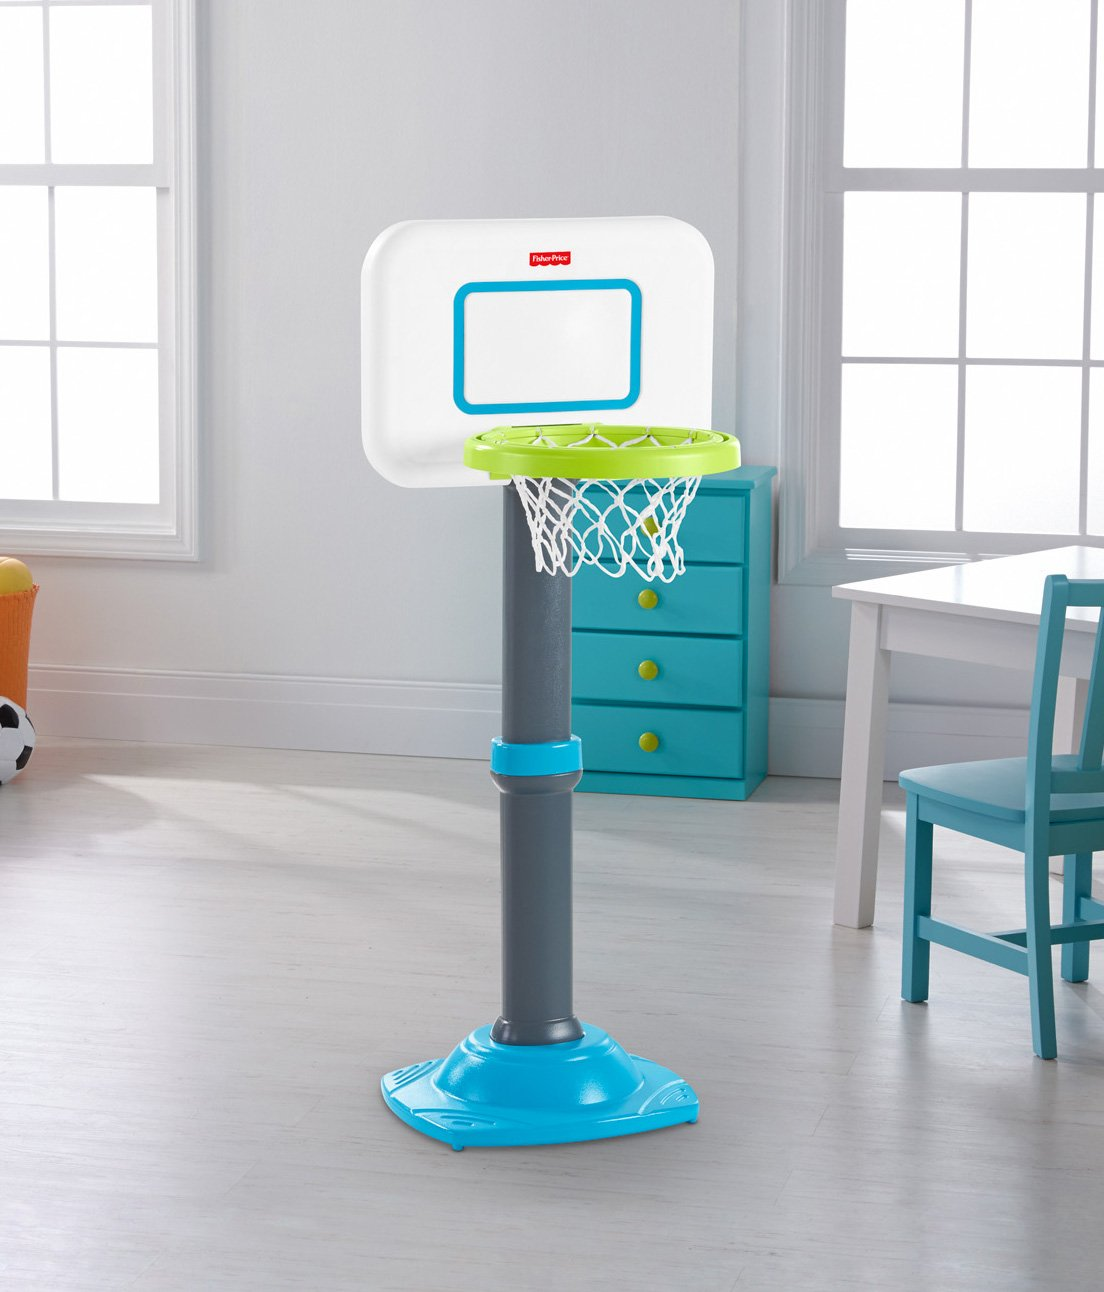 Amazon.com: Fisher-Price Grow-to-Pro Junior Basketball: Toys & Games